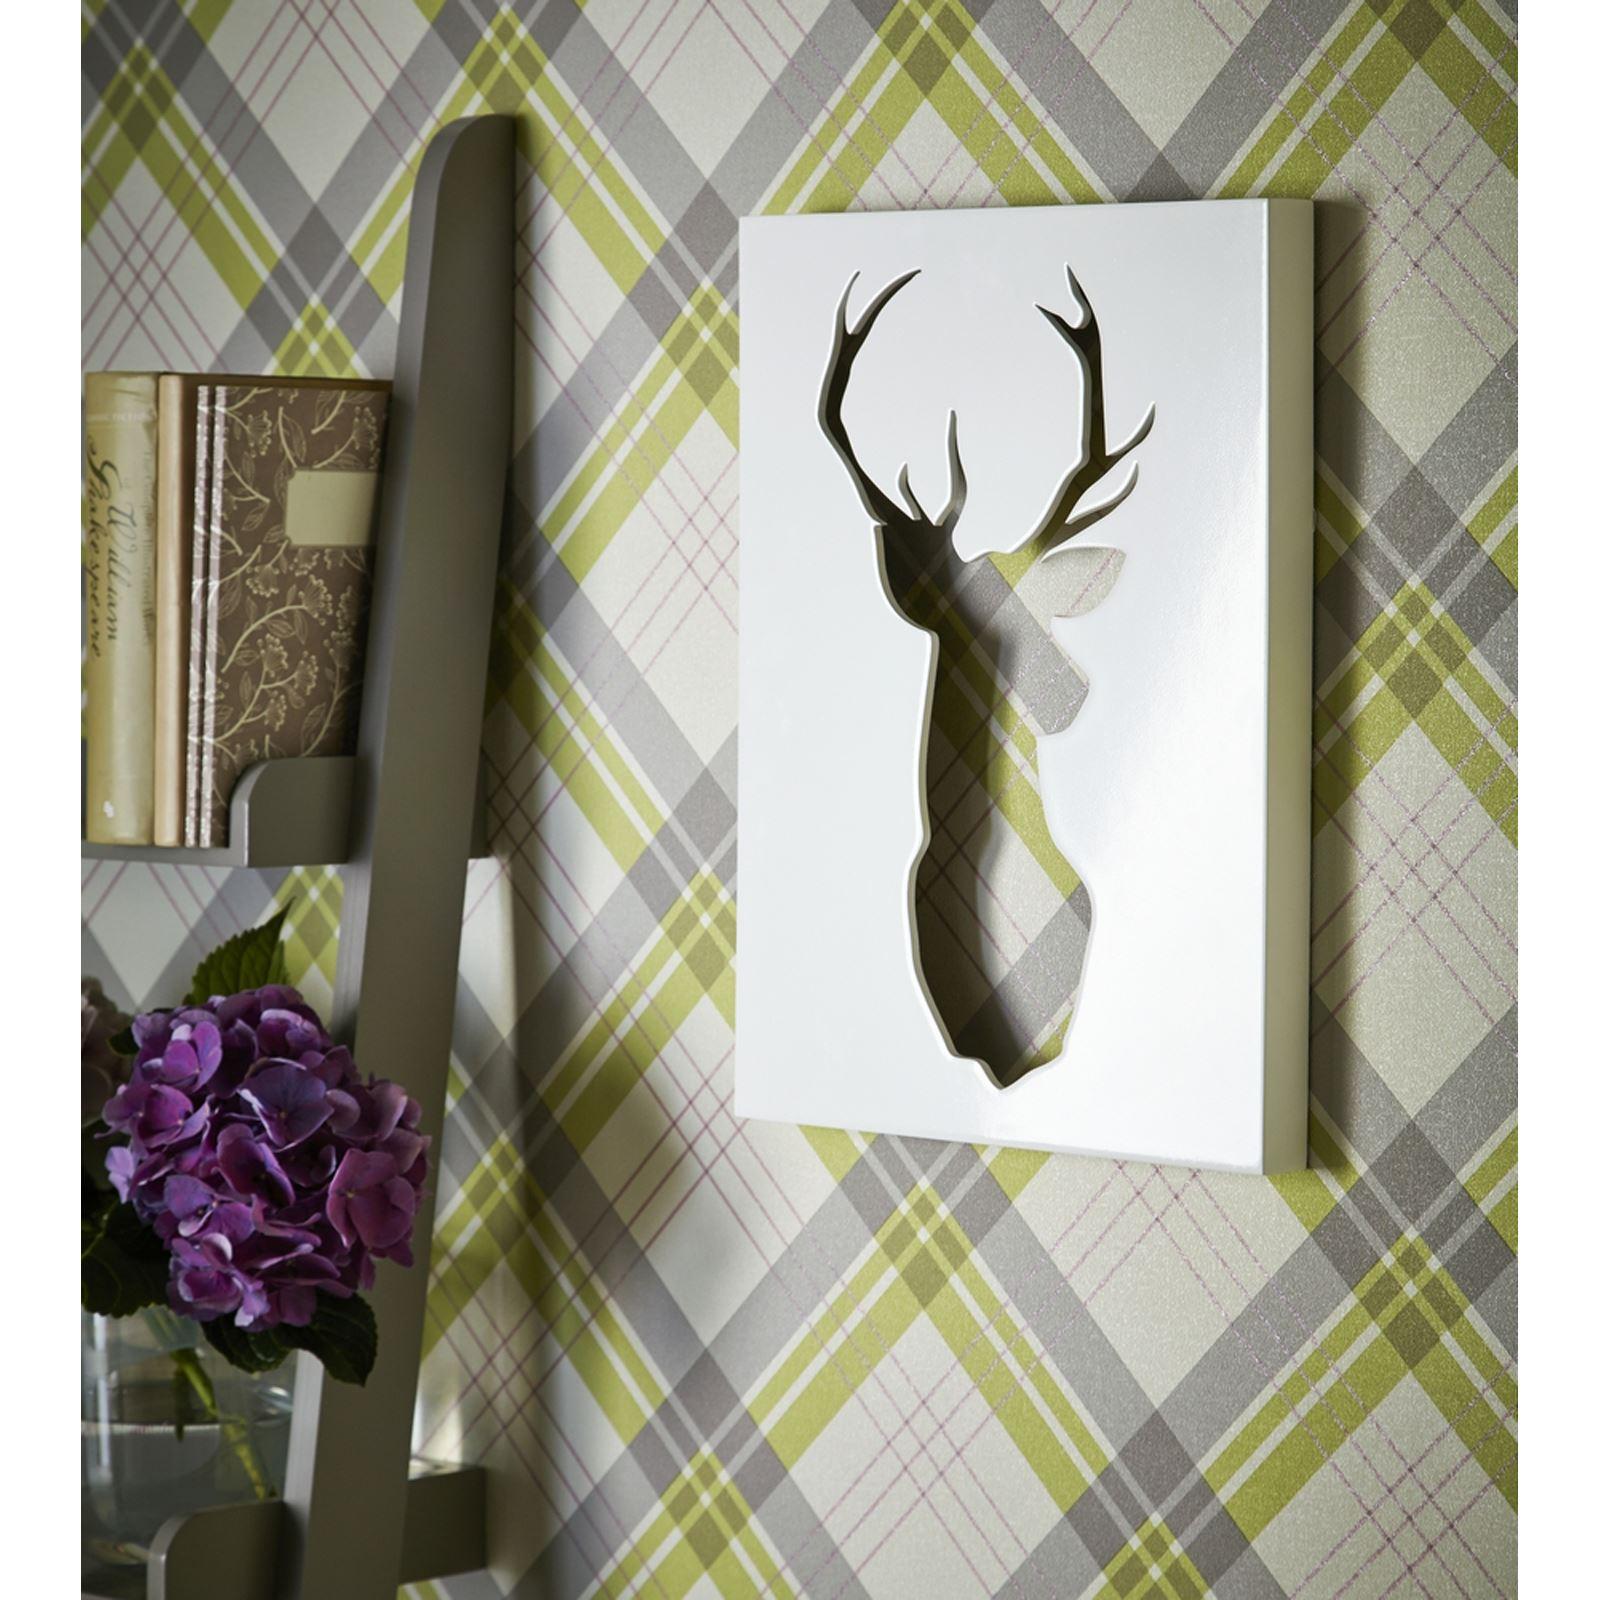 Tartan plaid checked wallpaper ideal for feature walls - Imagenes de paredes pintadas ...